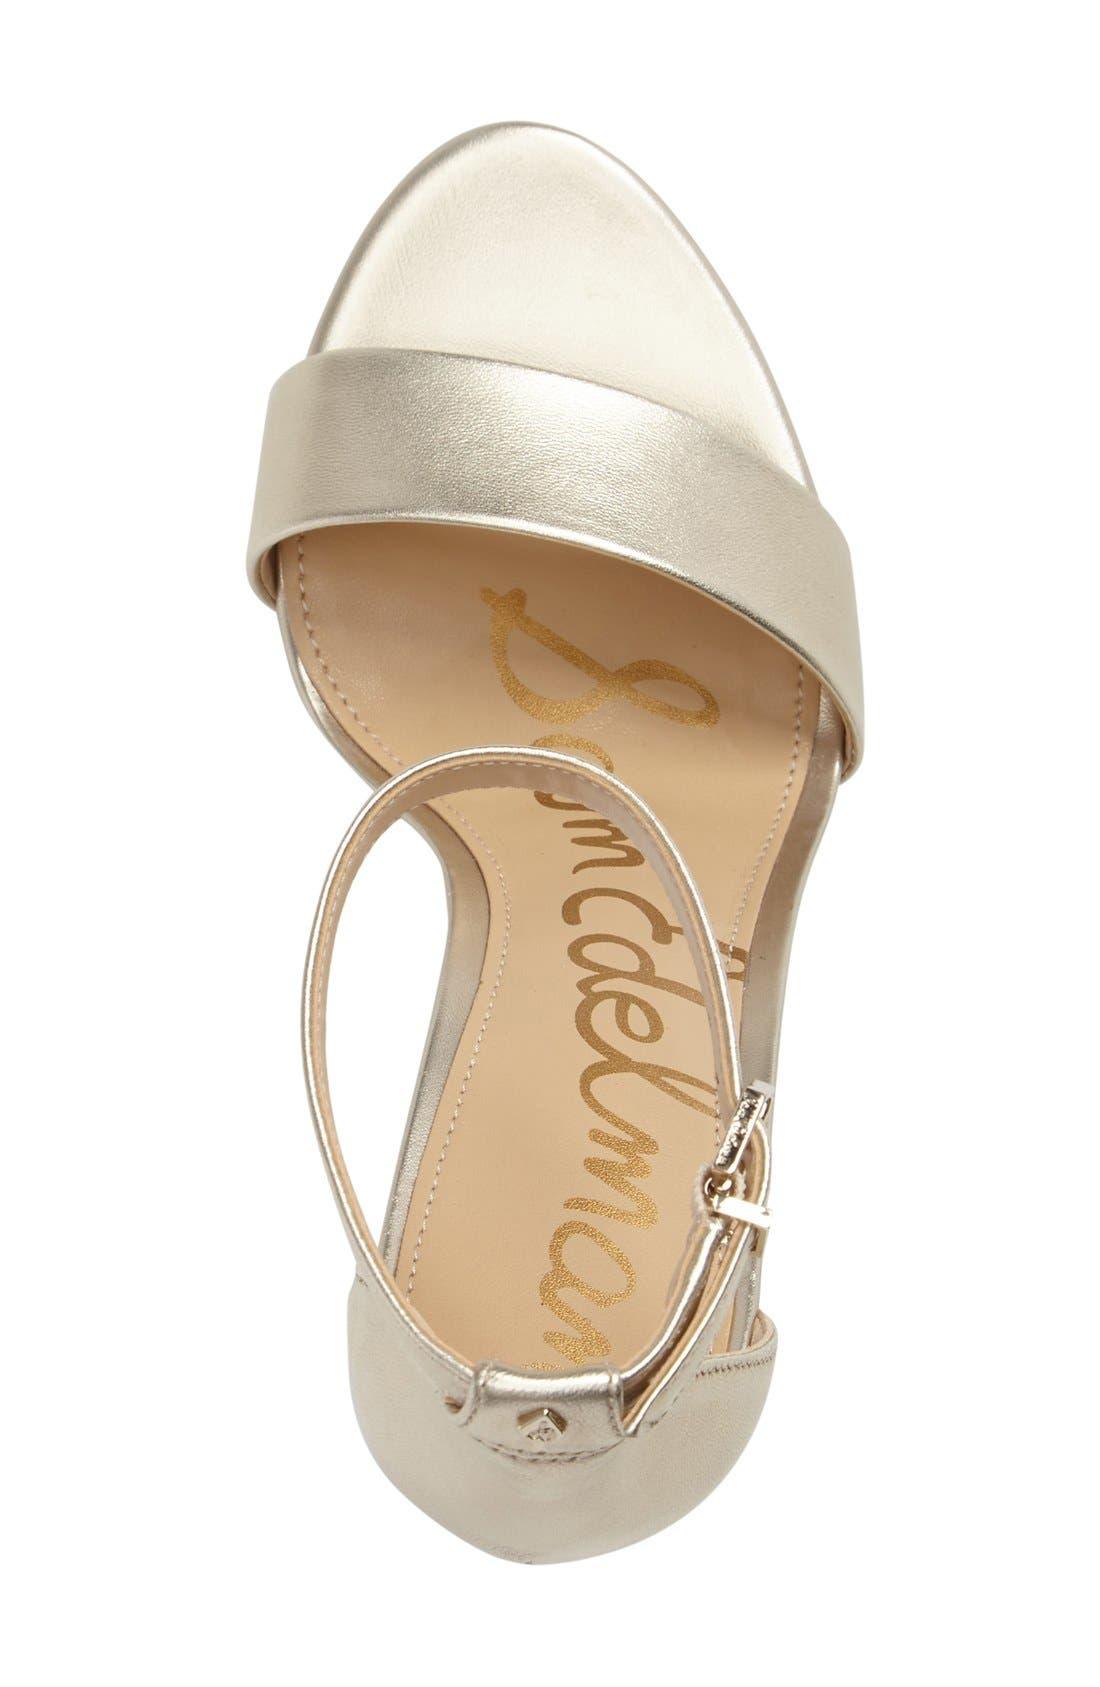 Yaro Ankle Strap Sandal,                             Alternate thumbnail 3, color,                             Jute Leather